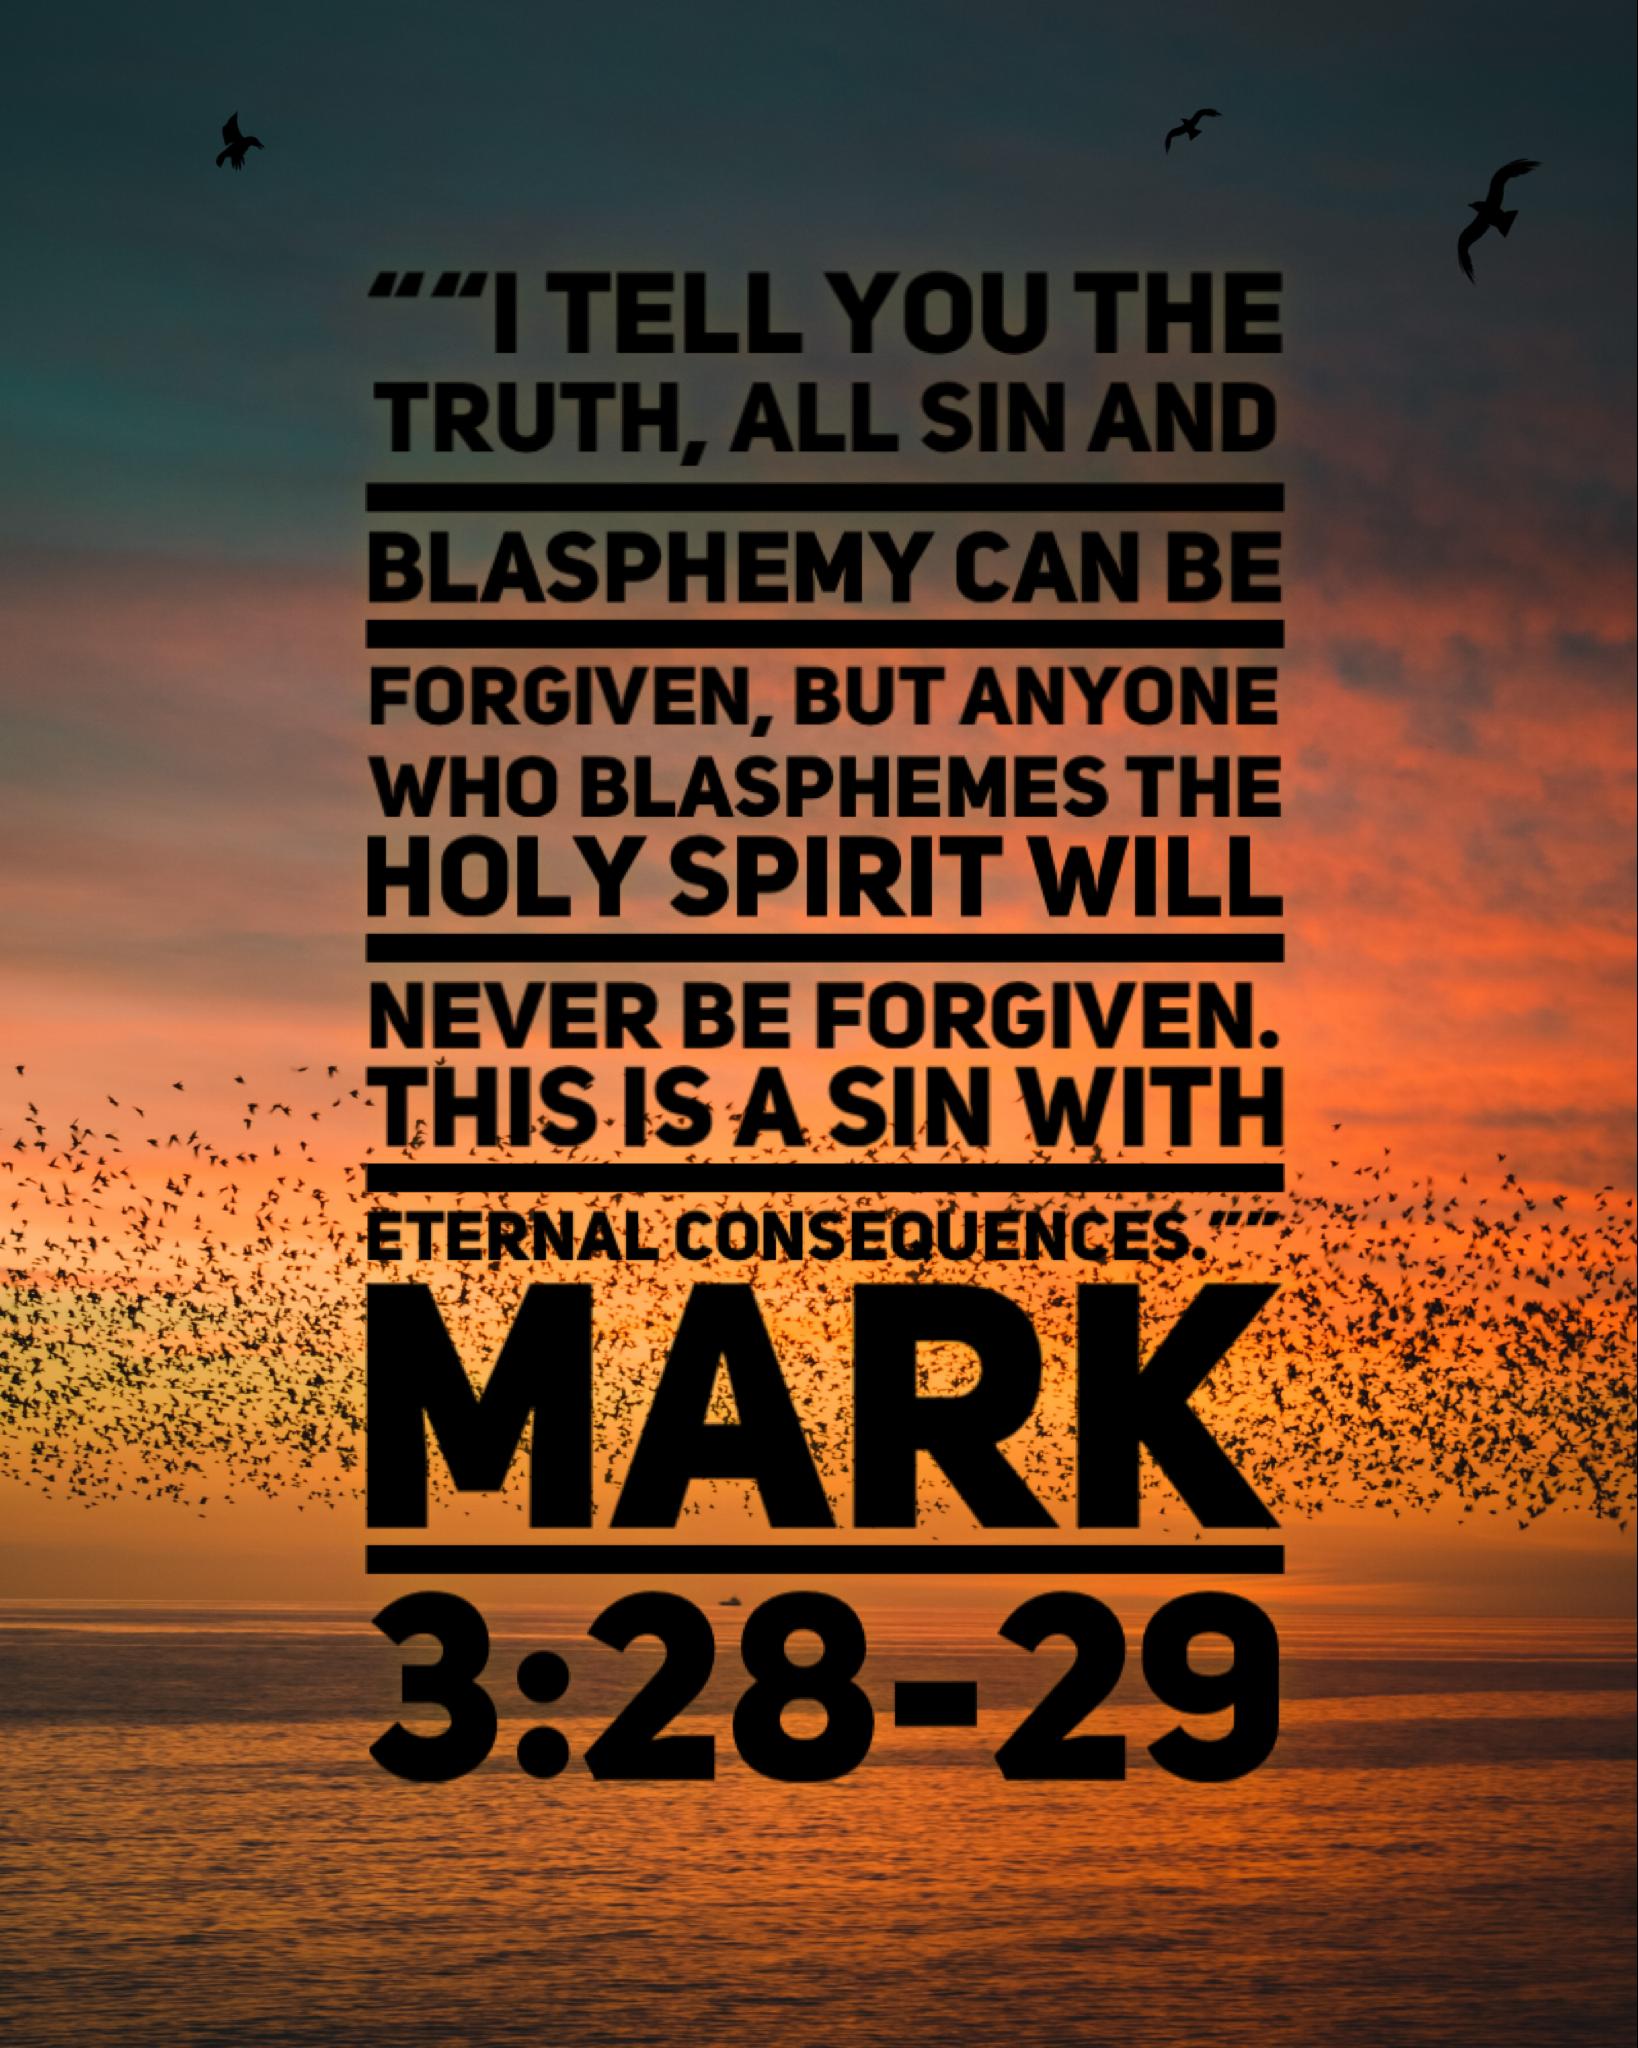 Never Blaspheme the Holy Spirit in 2020 | Holy spirit, Bible truth, All sins